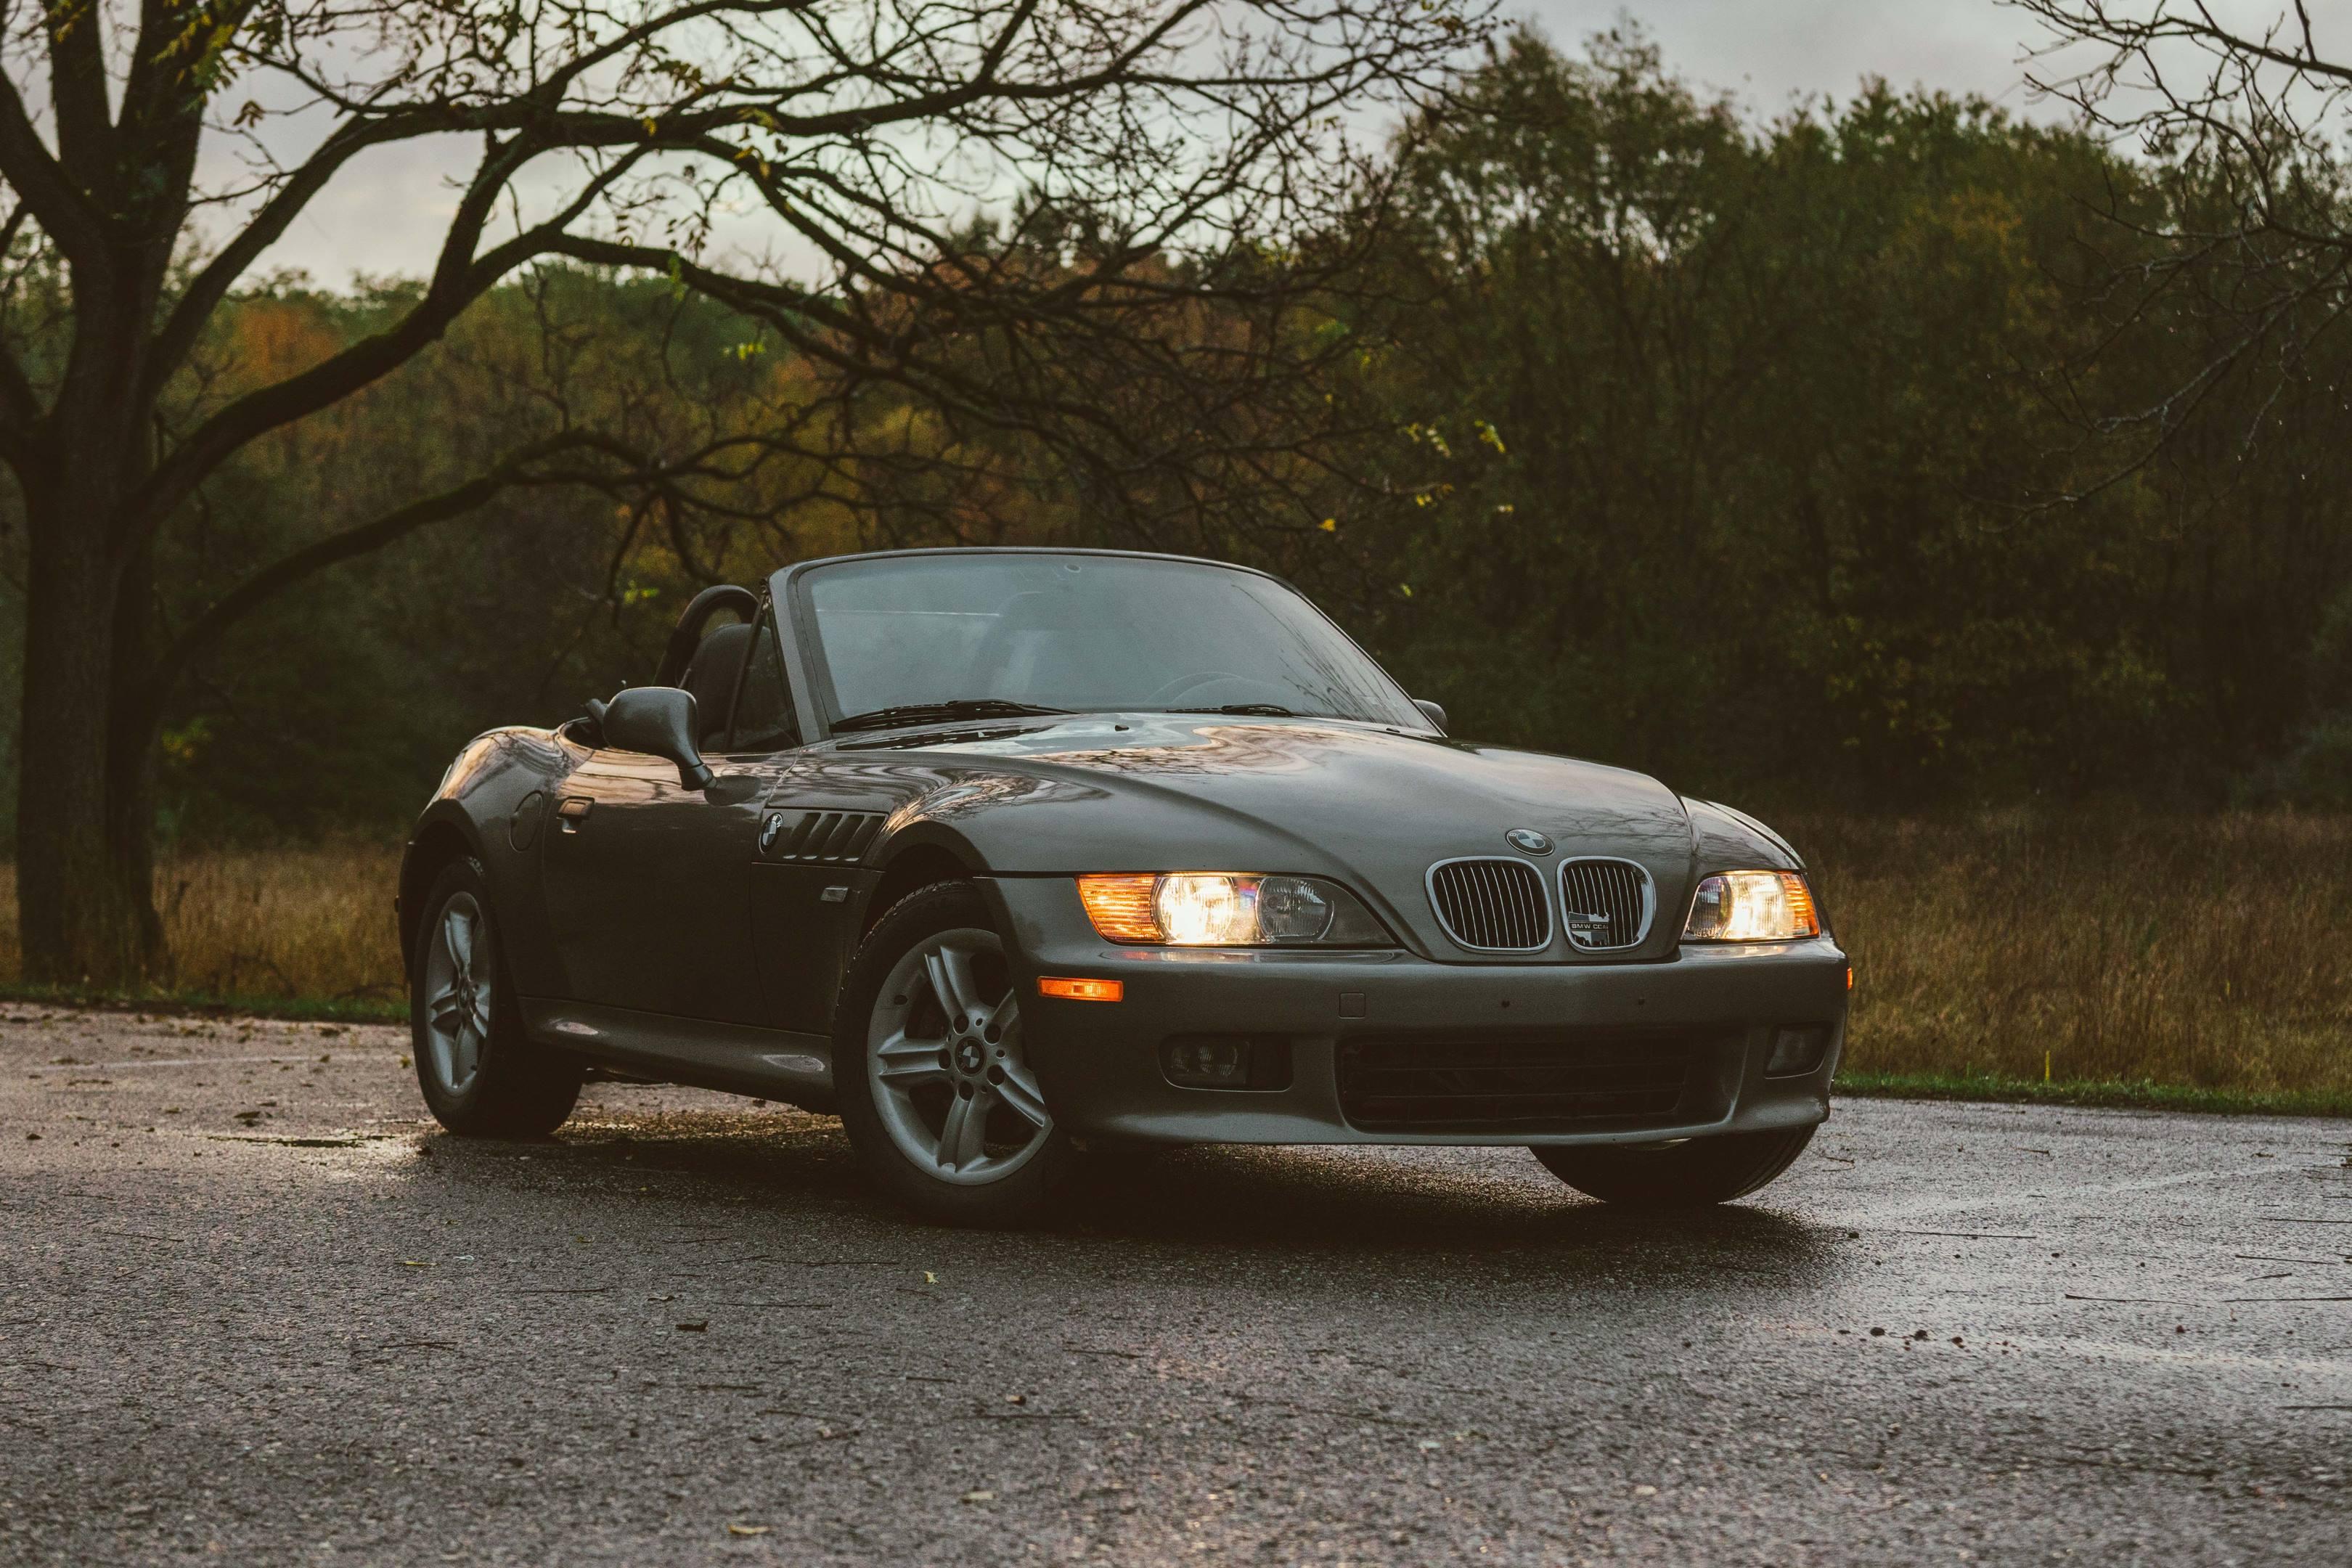 2001 BMW Z3 2.5i front 3/4